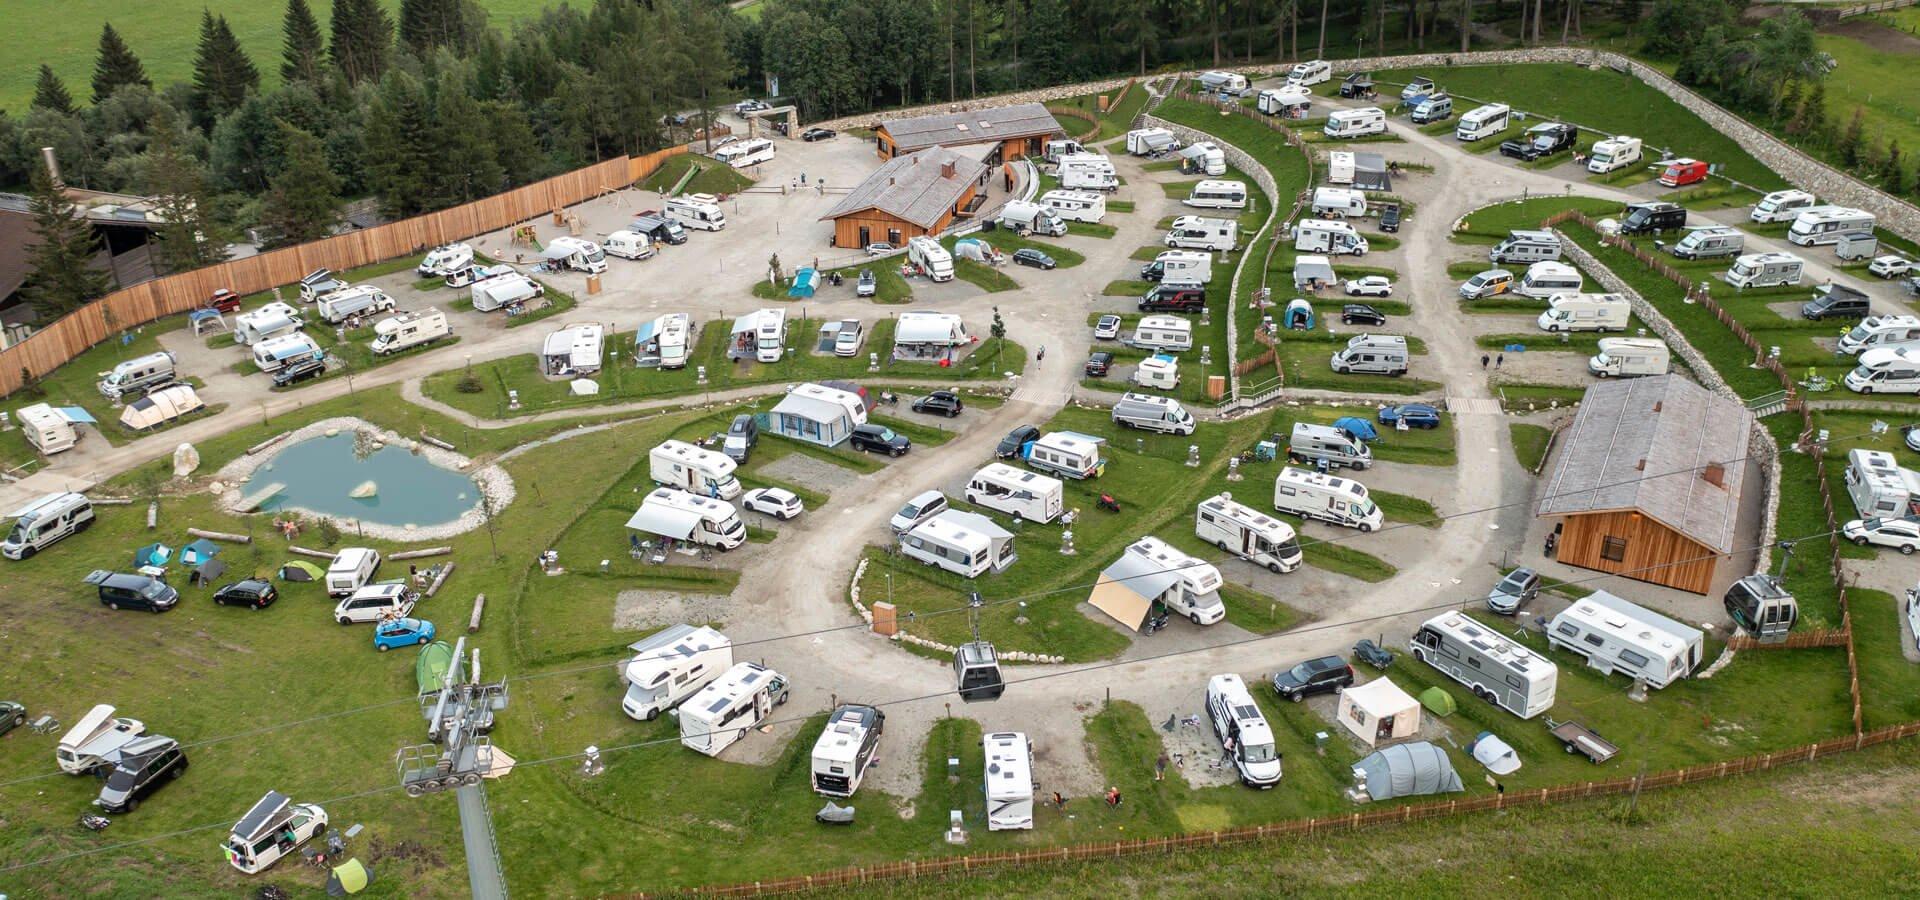 Camping Lärchwiese – Natur Camping in Vals Südtirol